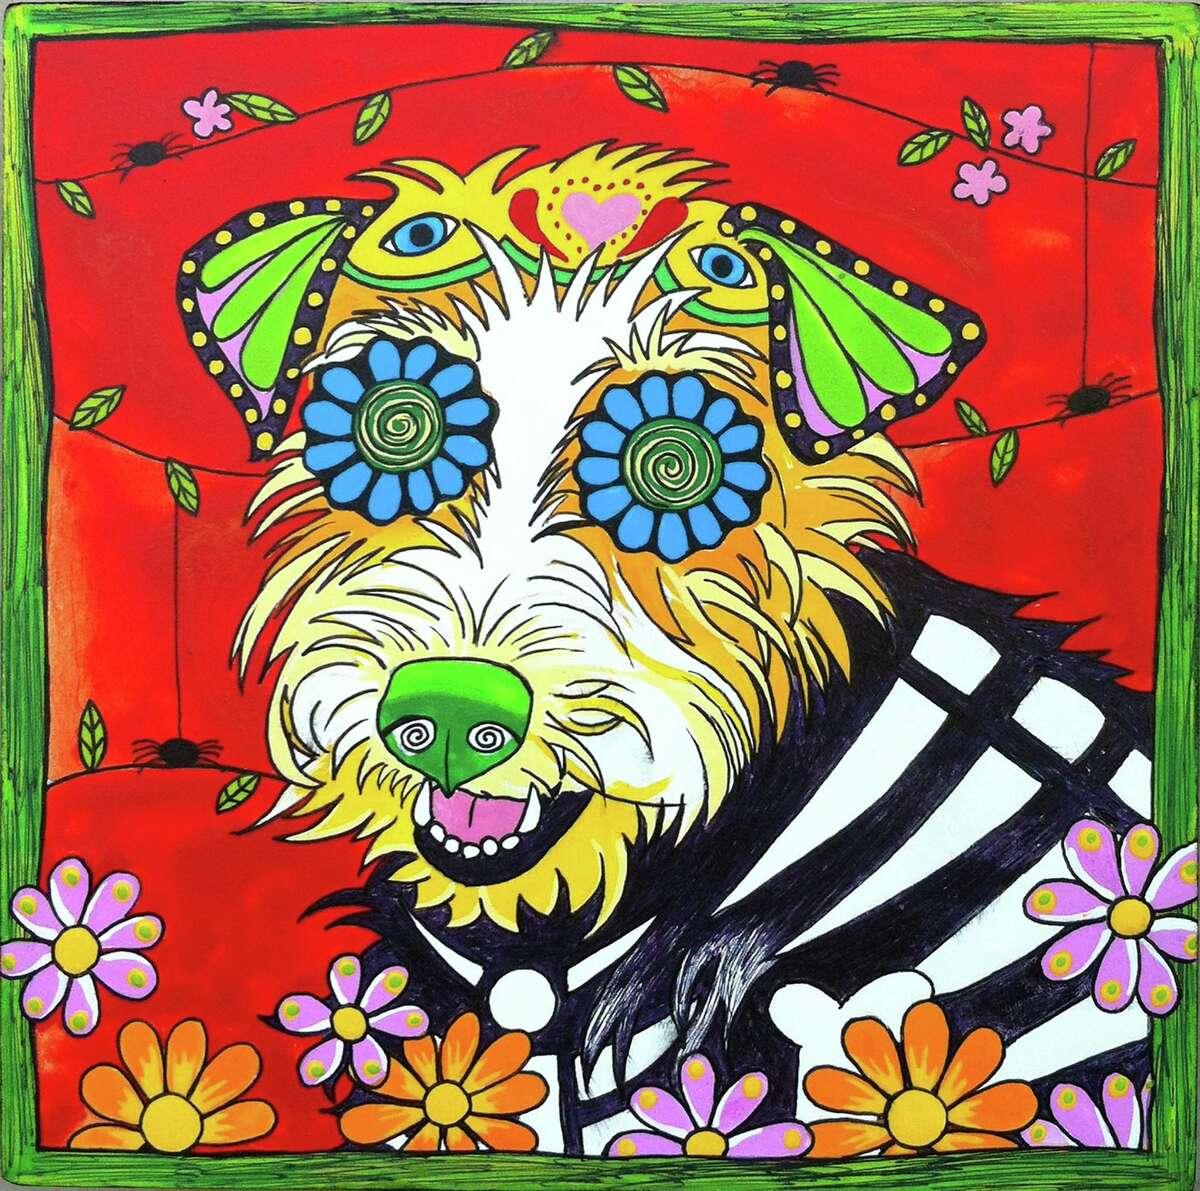 """Dottie, the Jack Russell Terrier"" by San Antonio-based artist Robin Arthur of RobiniArt, who does pet portraits inspired by el Día de los Muertos."